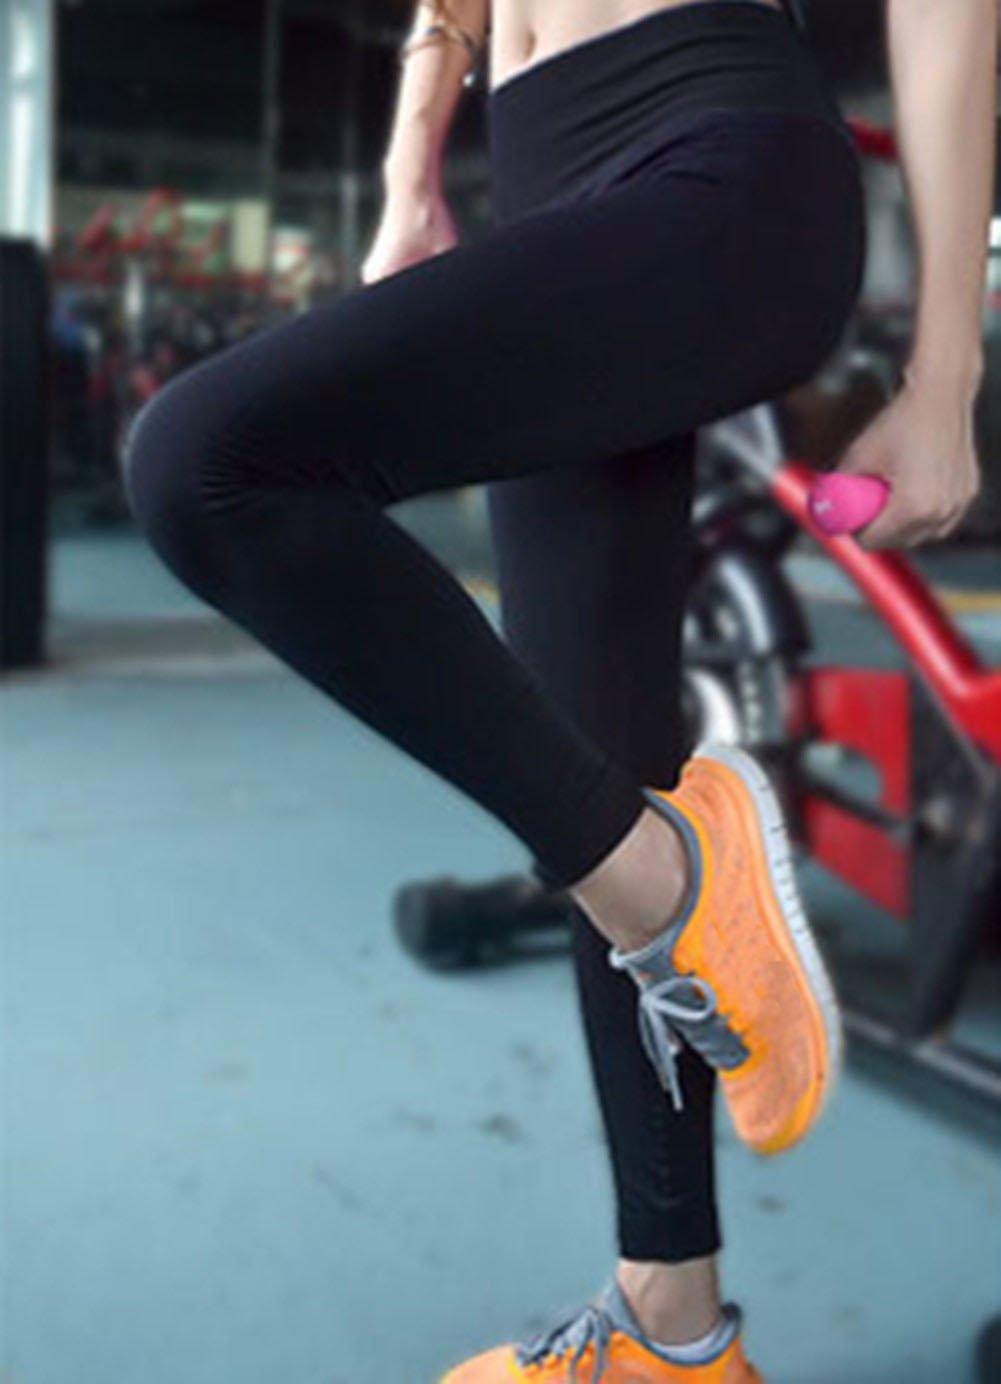 CRAZY Women's Sportswear Set Gym Jogging Bra Outfit Racerback Leggings Top+Pa... by Crazy (Image #2)